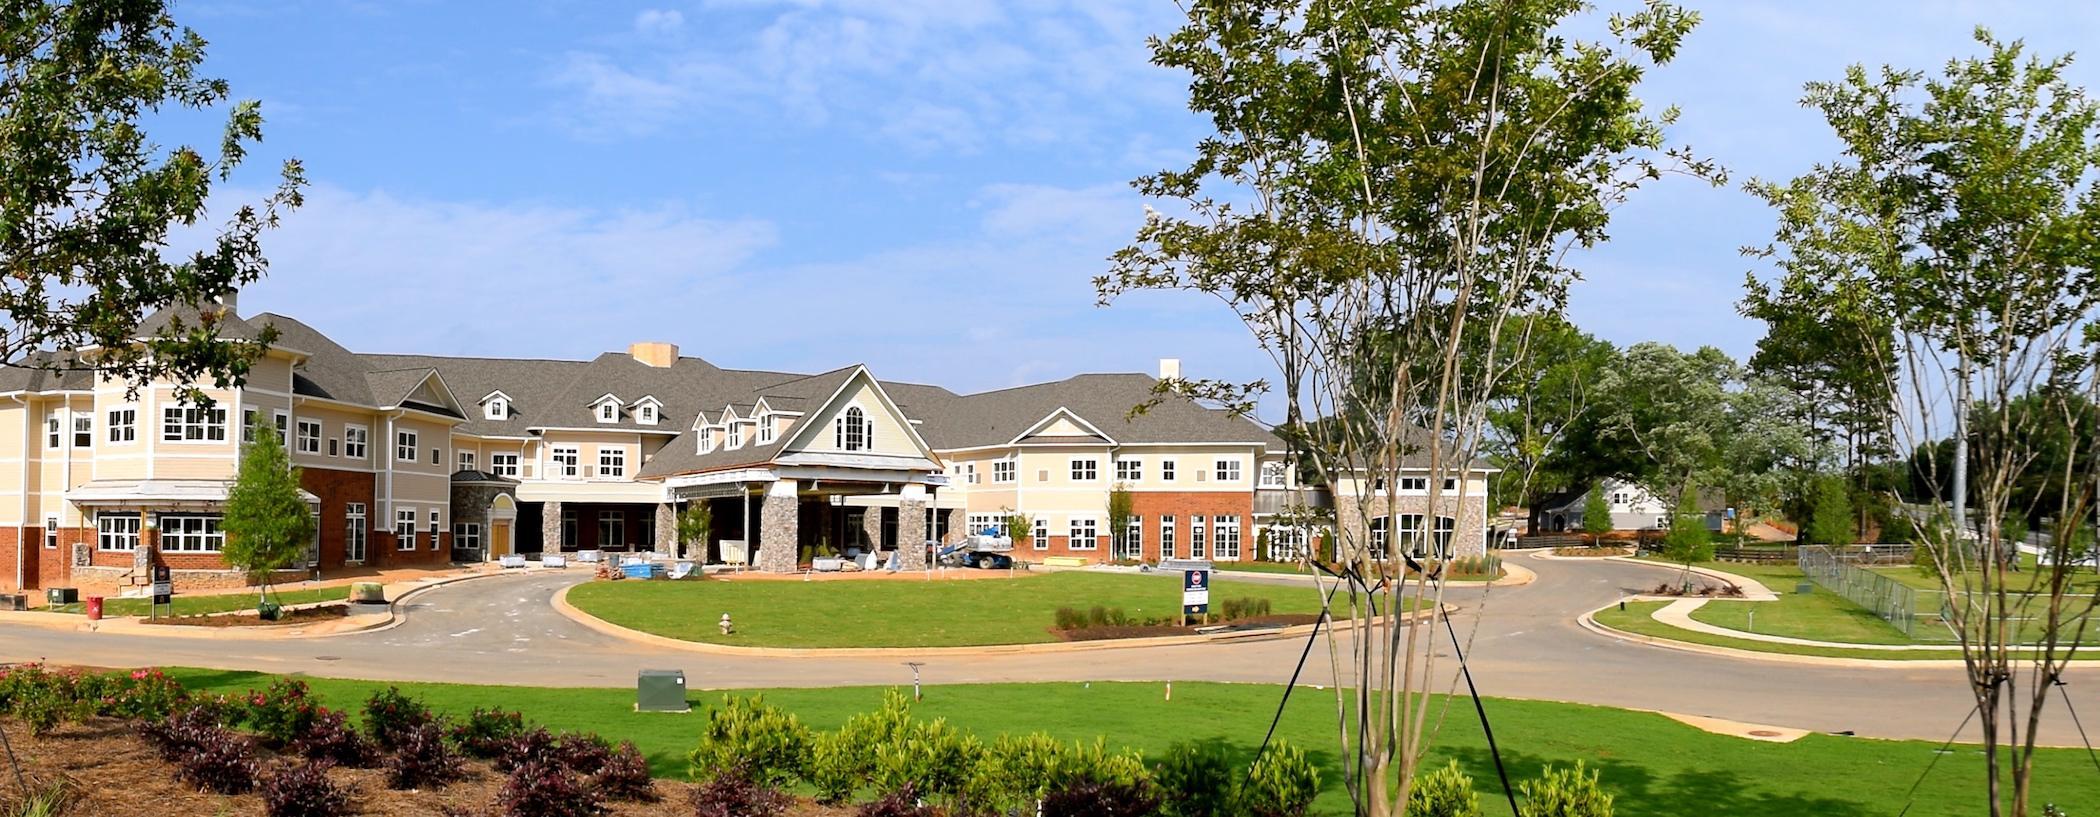 Sterling Estates Senior Living Communities Build On Their